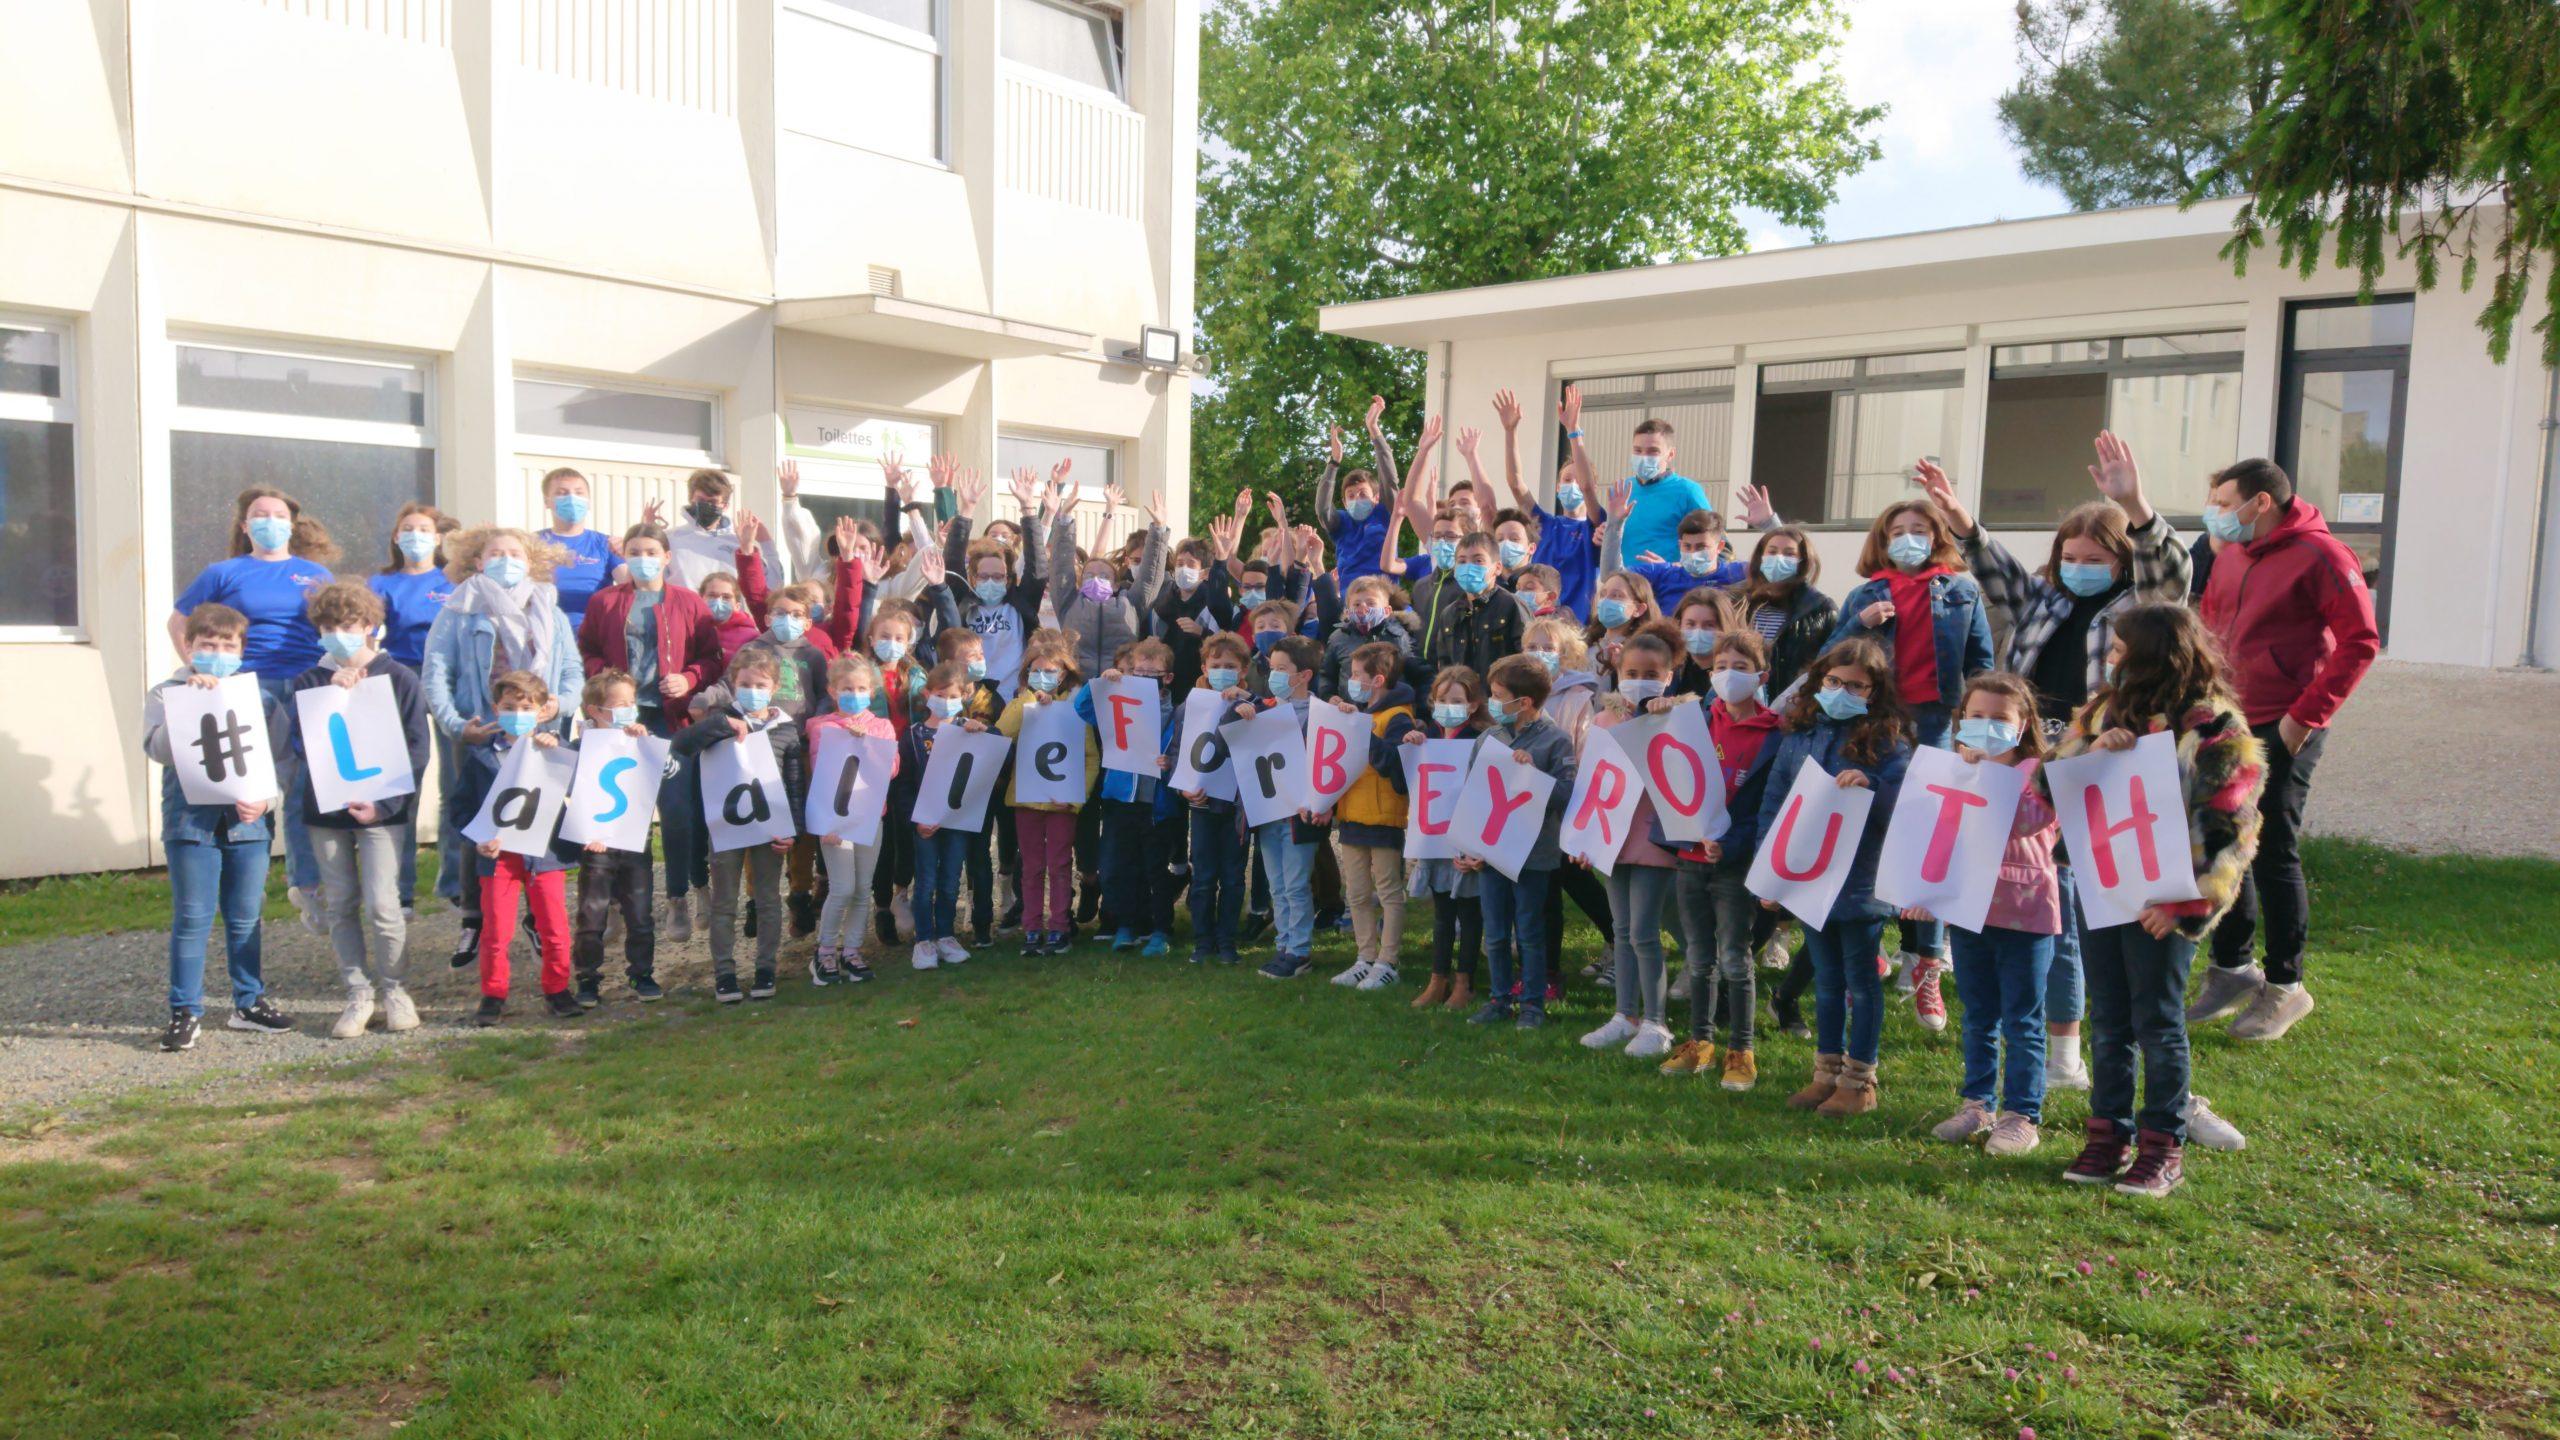 #LaSalleforBeirut [Fondation La Salle France]